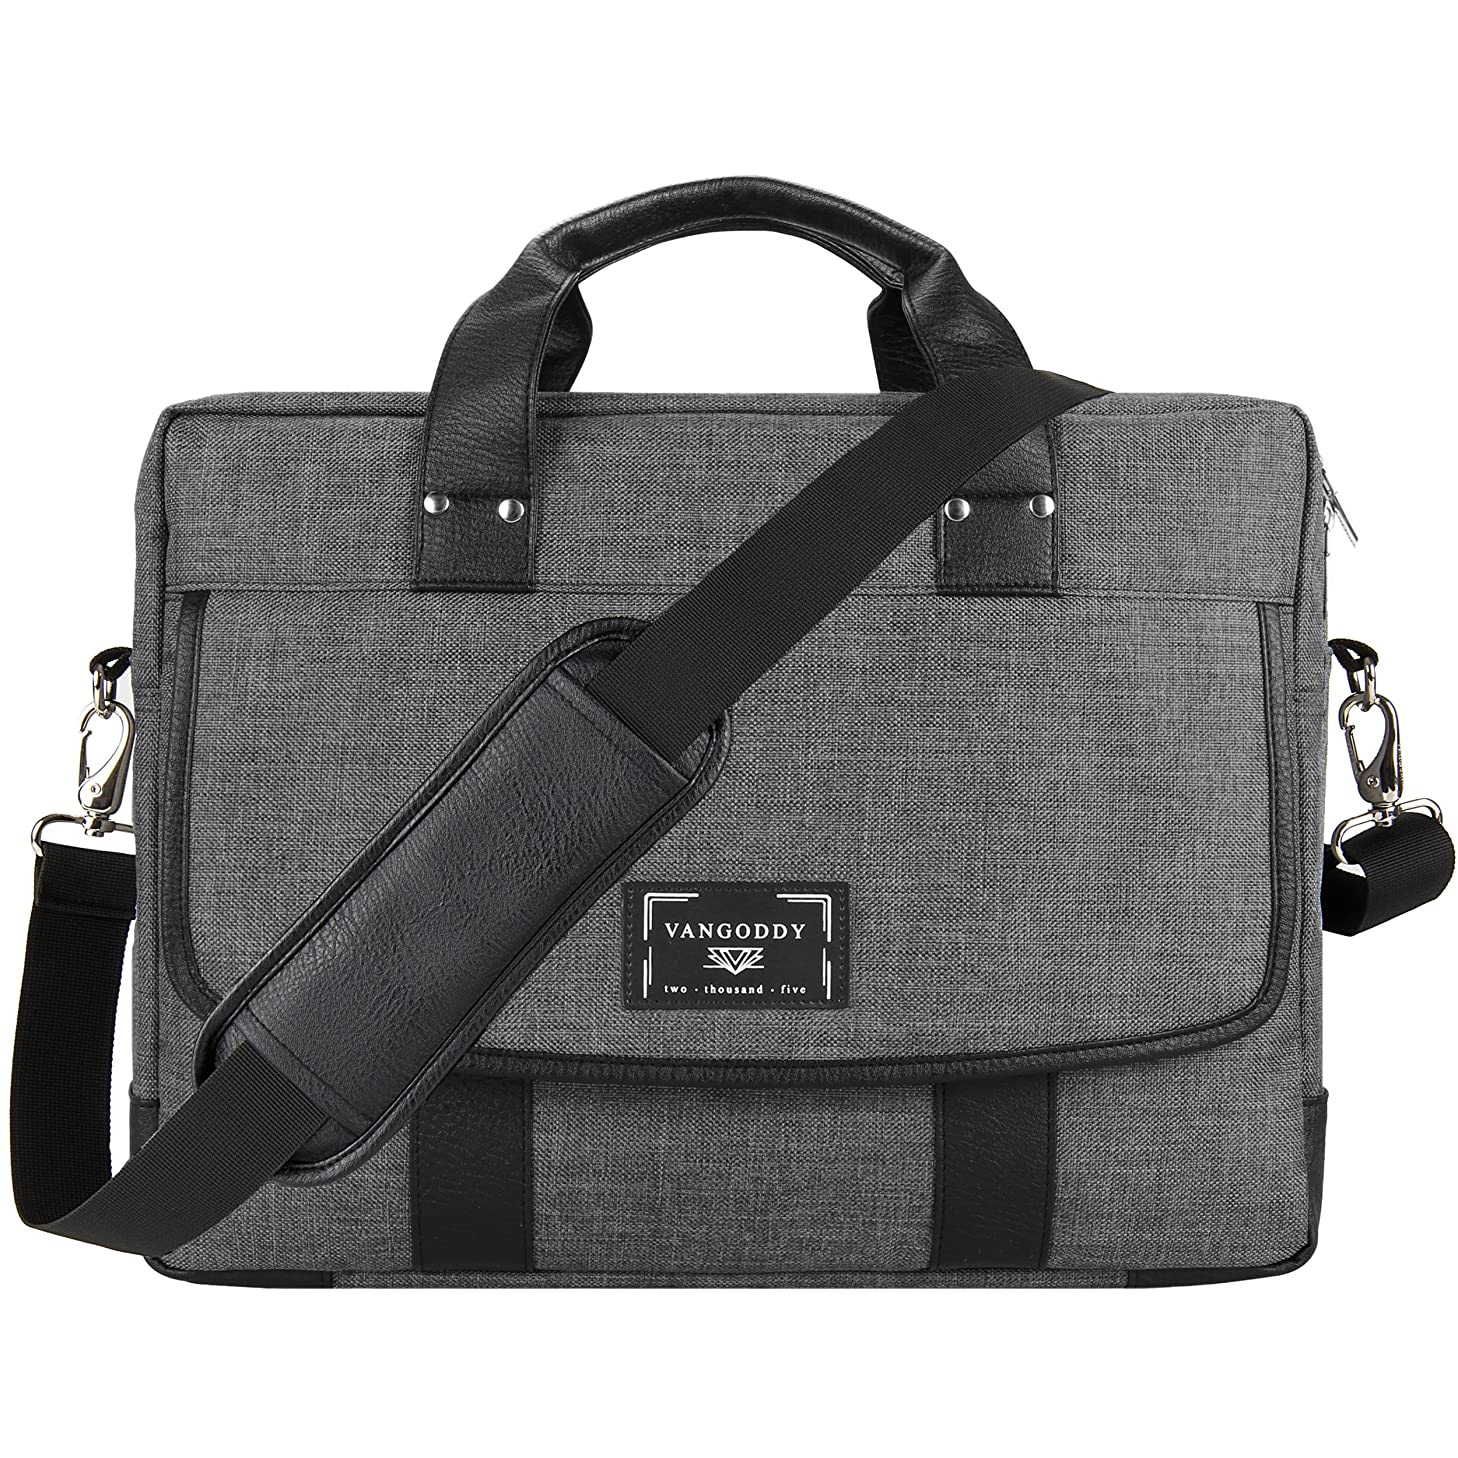 VanGoddy Chrono Laptop Bag for Lenovo Flex/IdeaPad/ThinkPad/Yoga/Legion 14